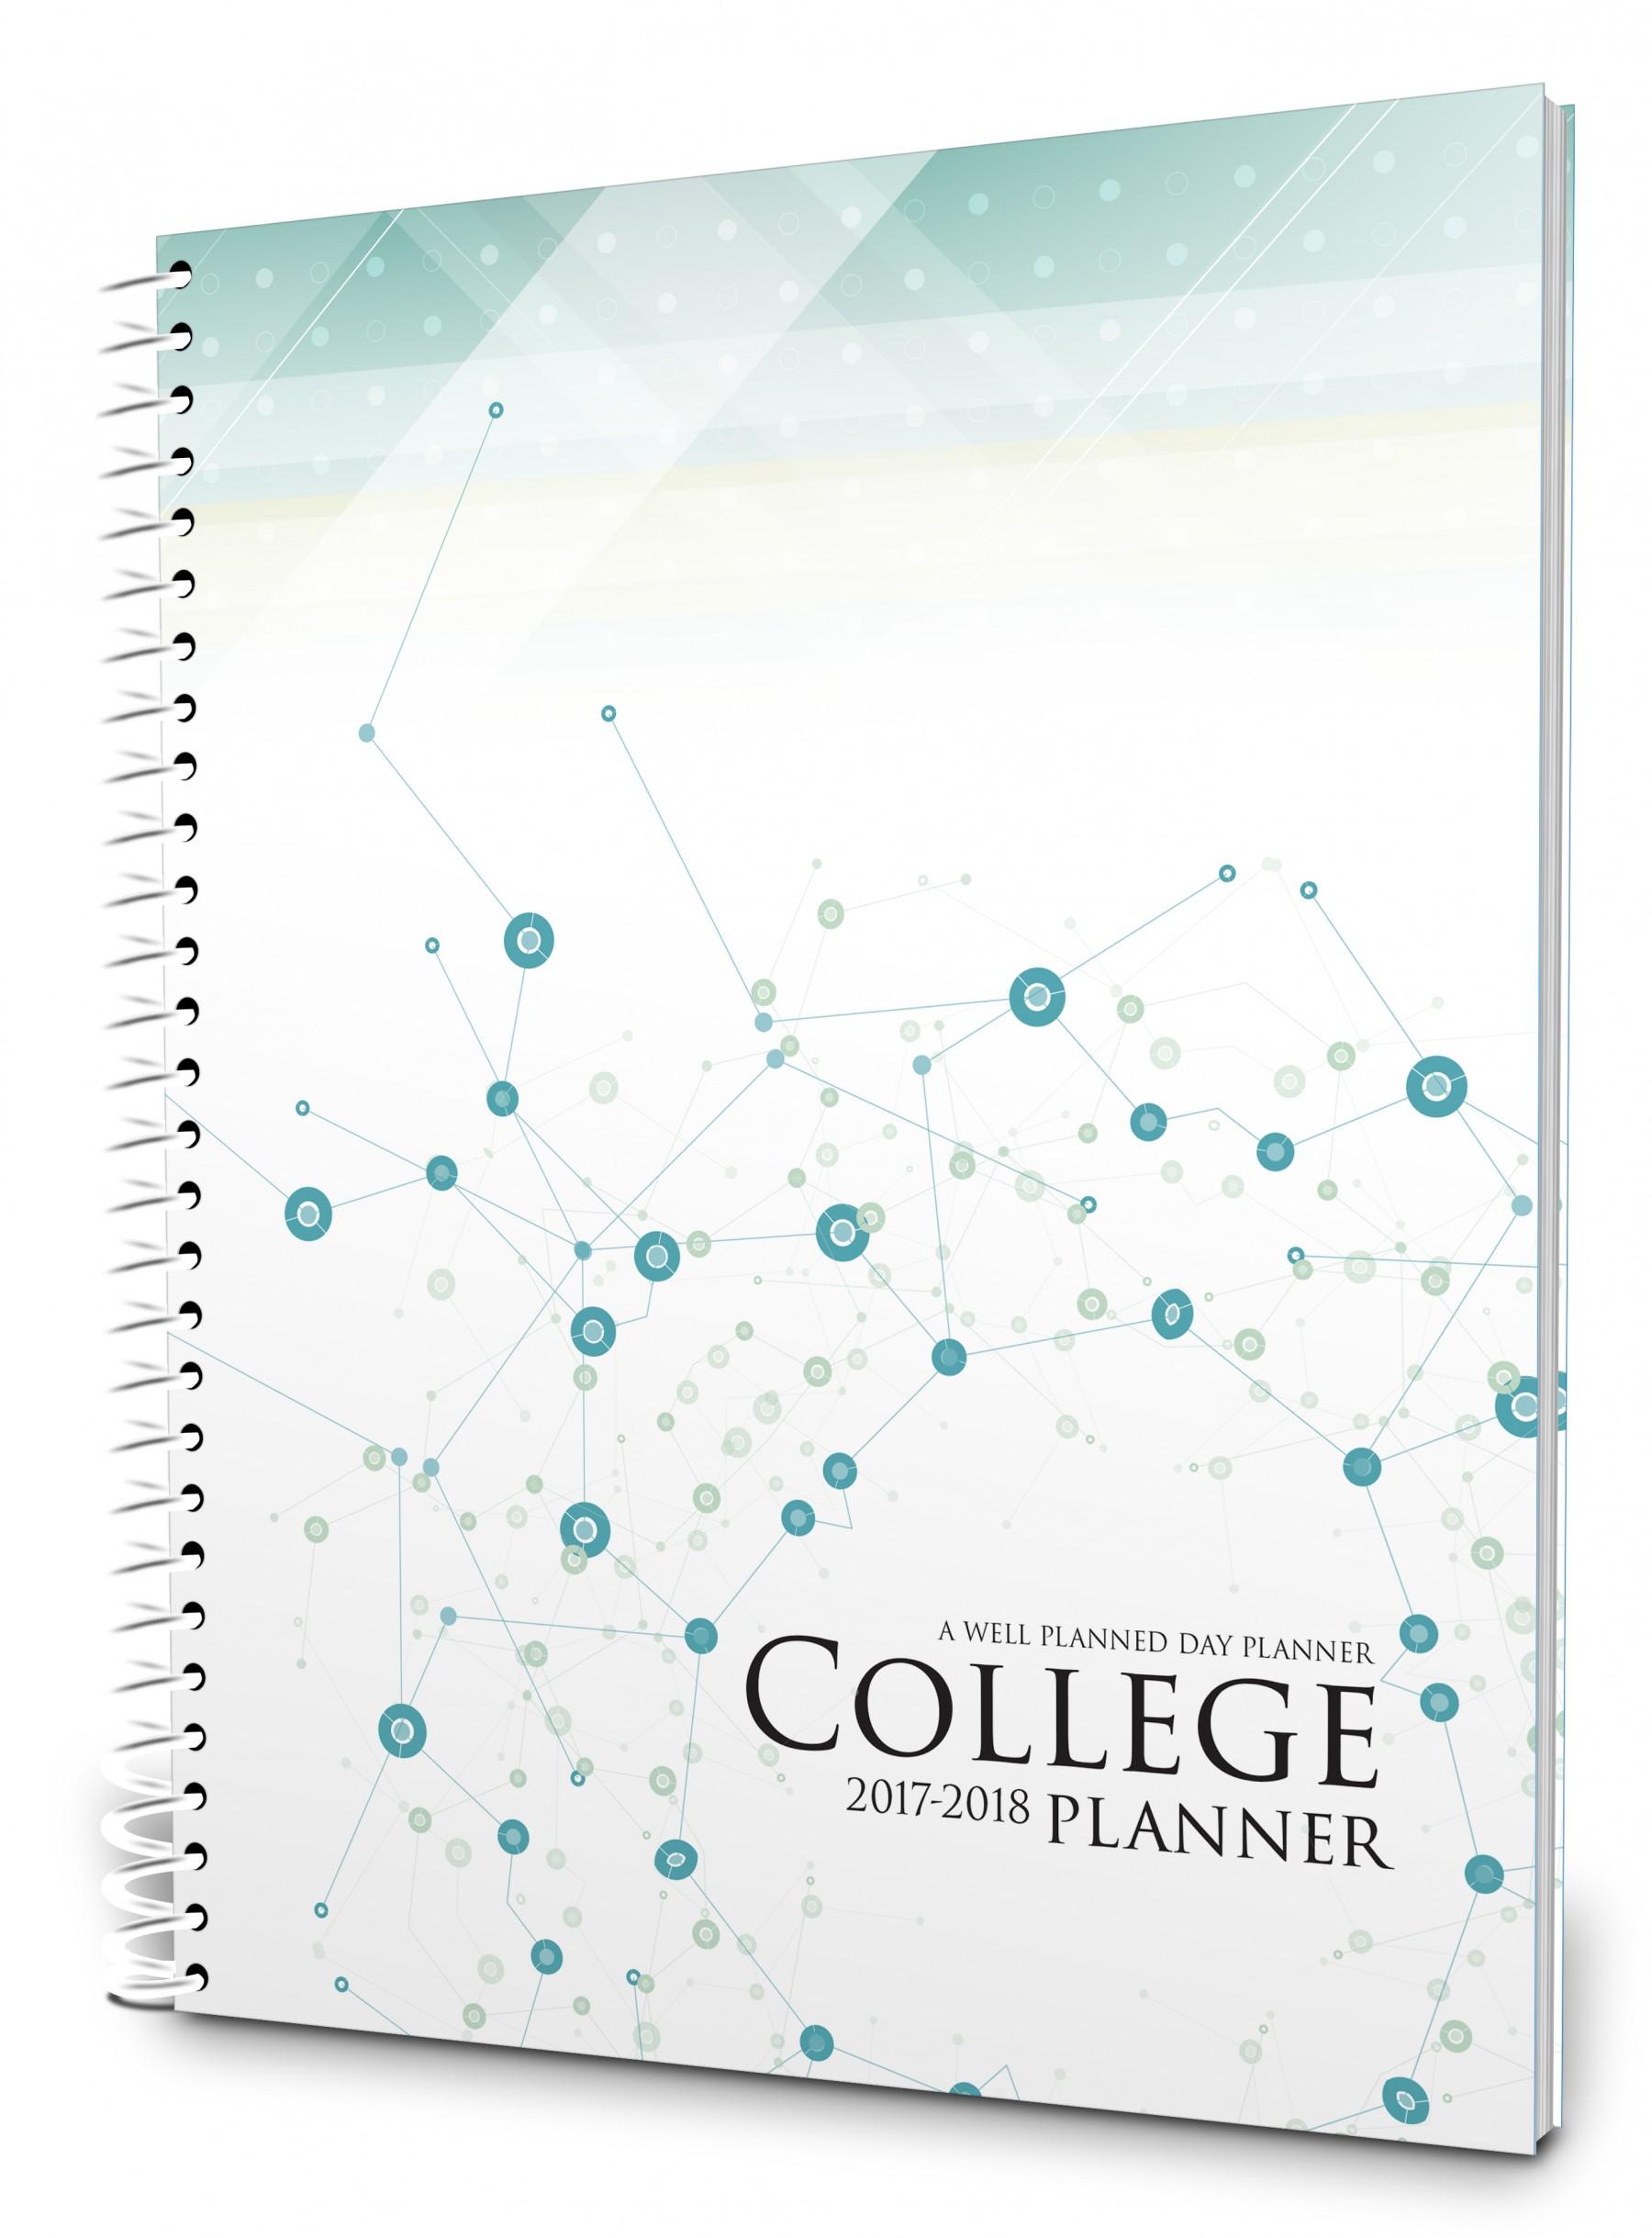 2017-2018 College